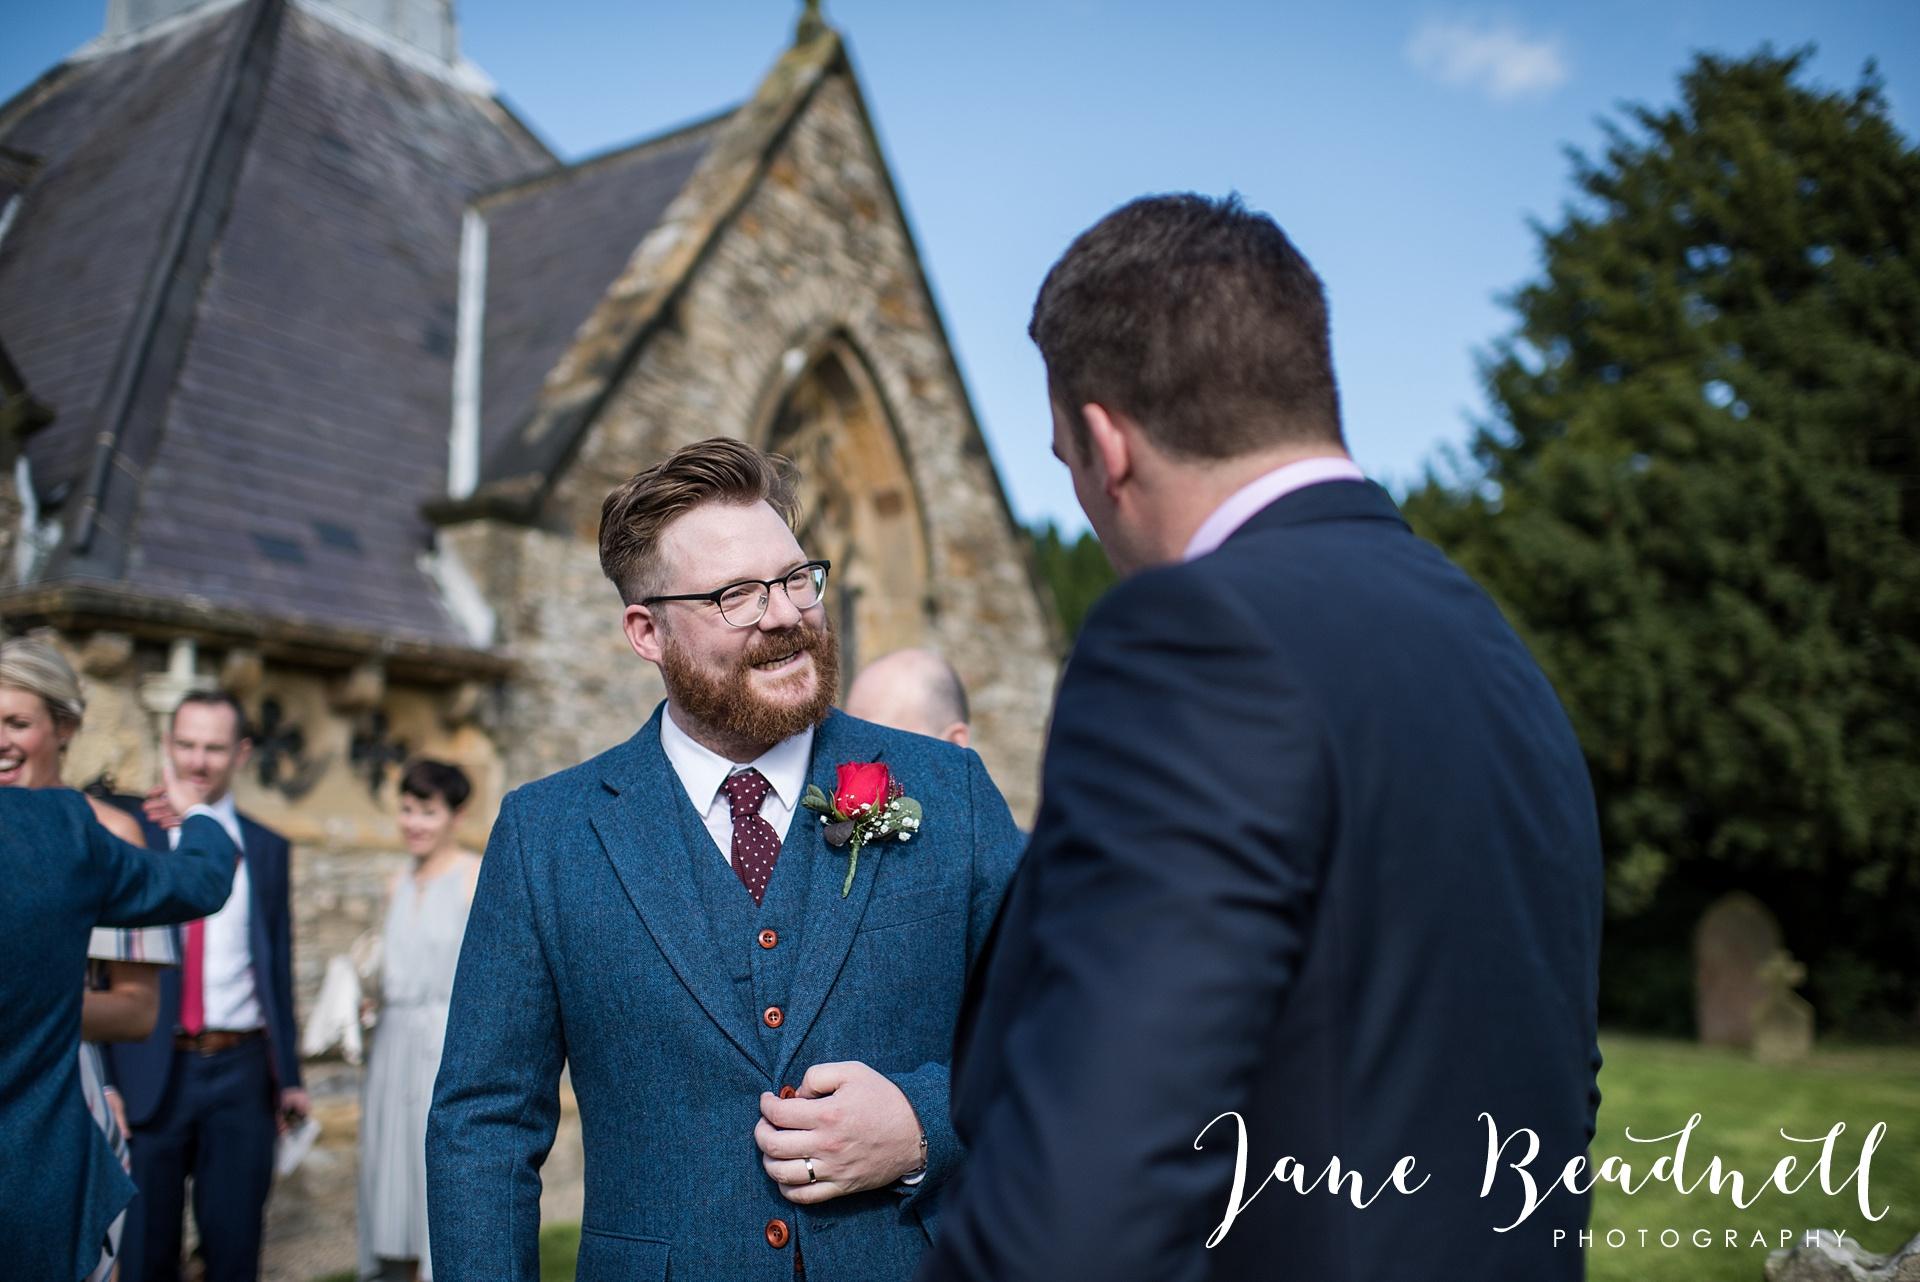 fine-art-wedding-photographer-jane-beadnell-yorkshire-wedding-photographer_0057